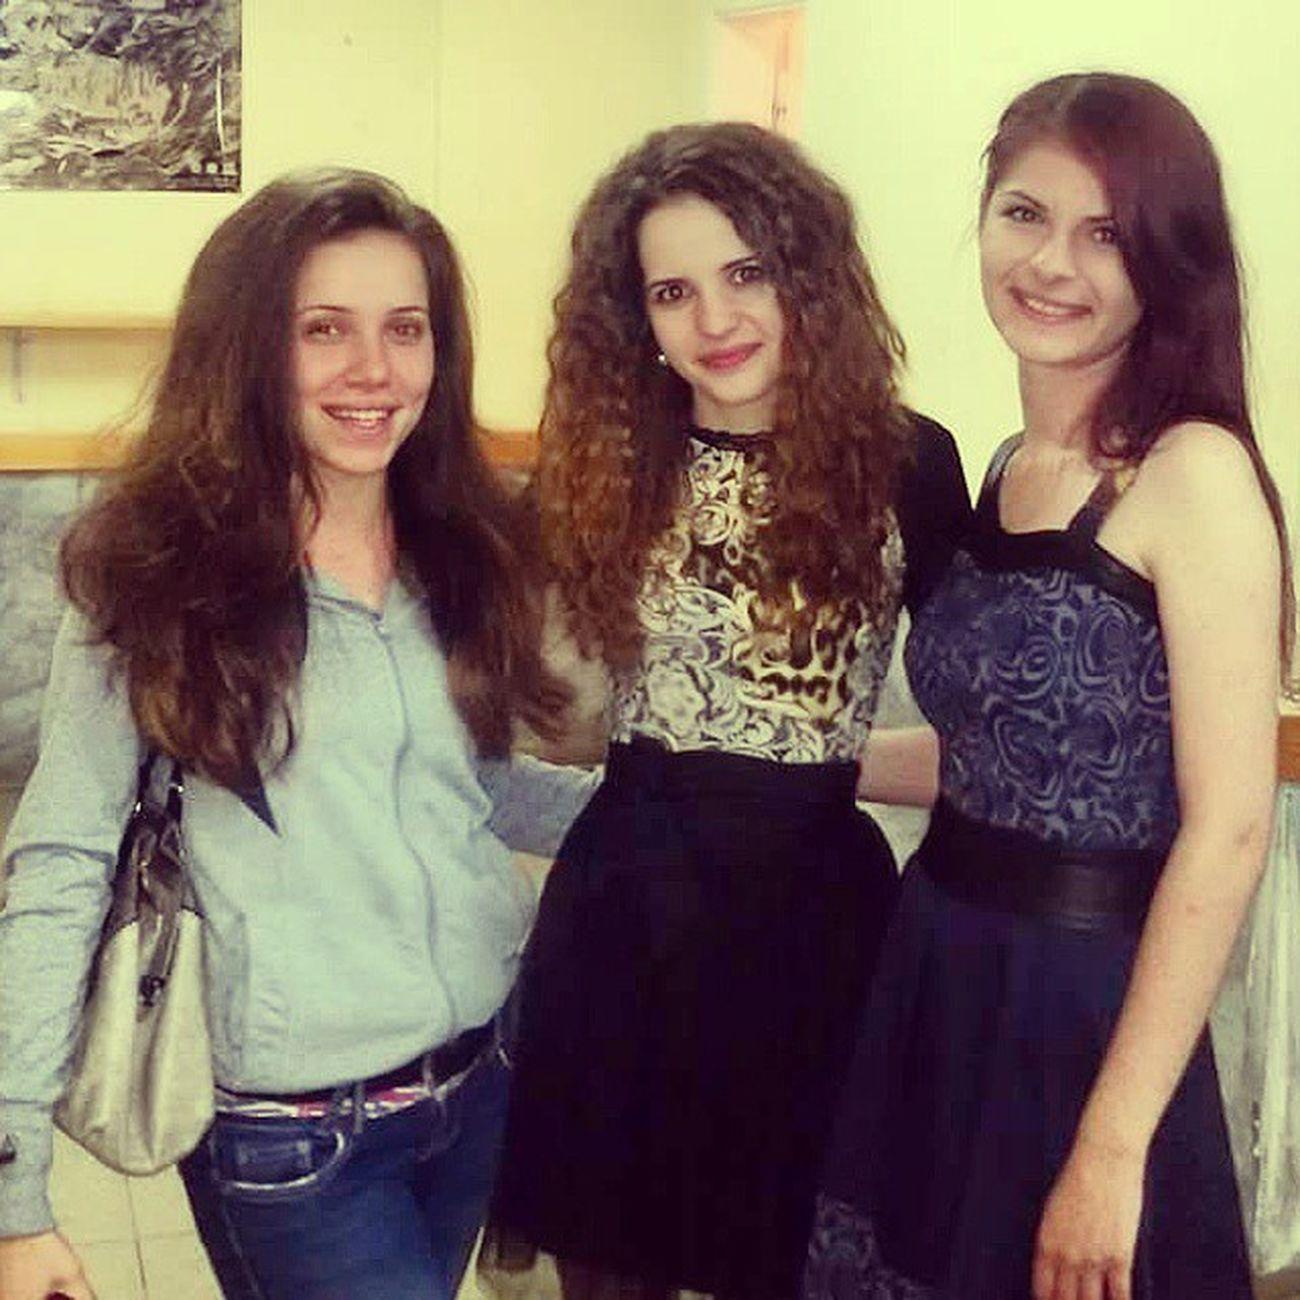 (: Girls Friendship Loveuall Partytime studentski grad